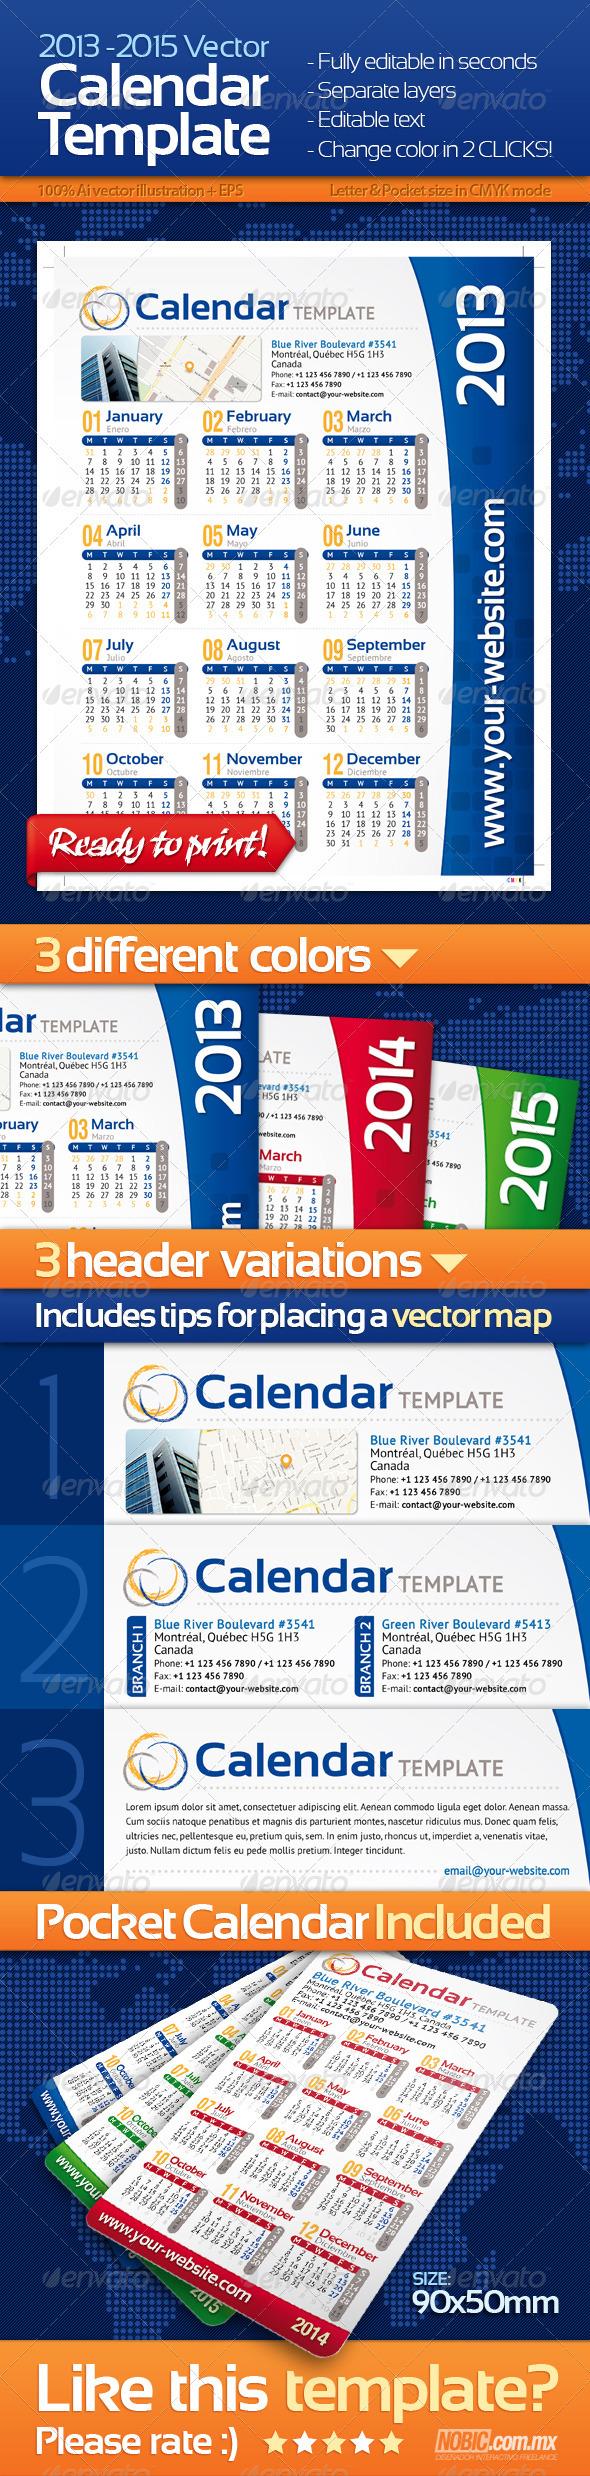 2013, 2014 and 2015 Calendar Template - Calendars Stationery